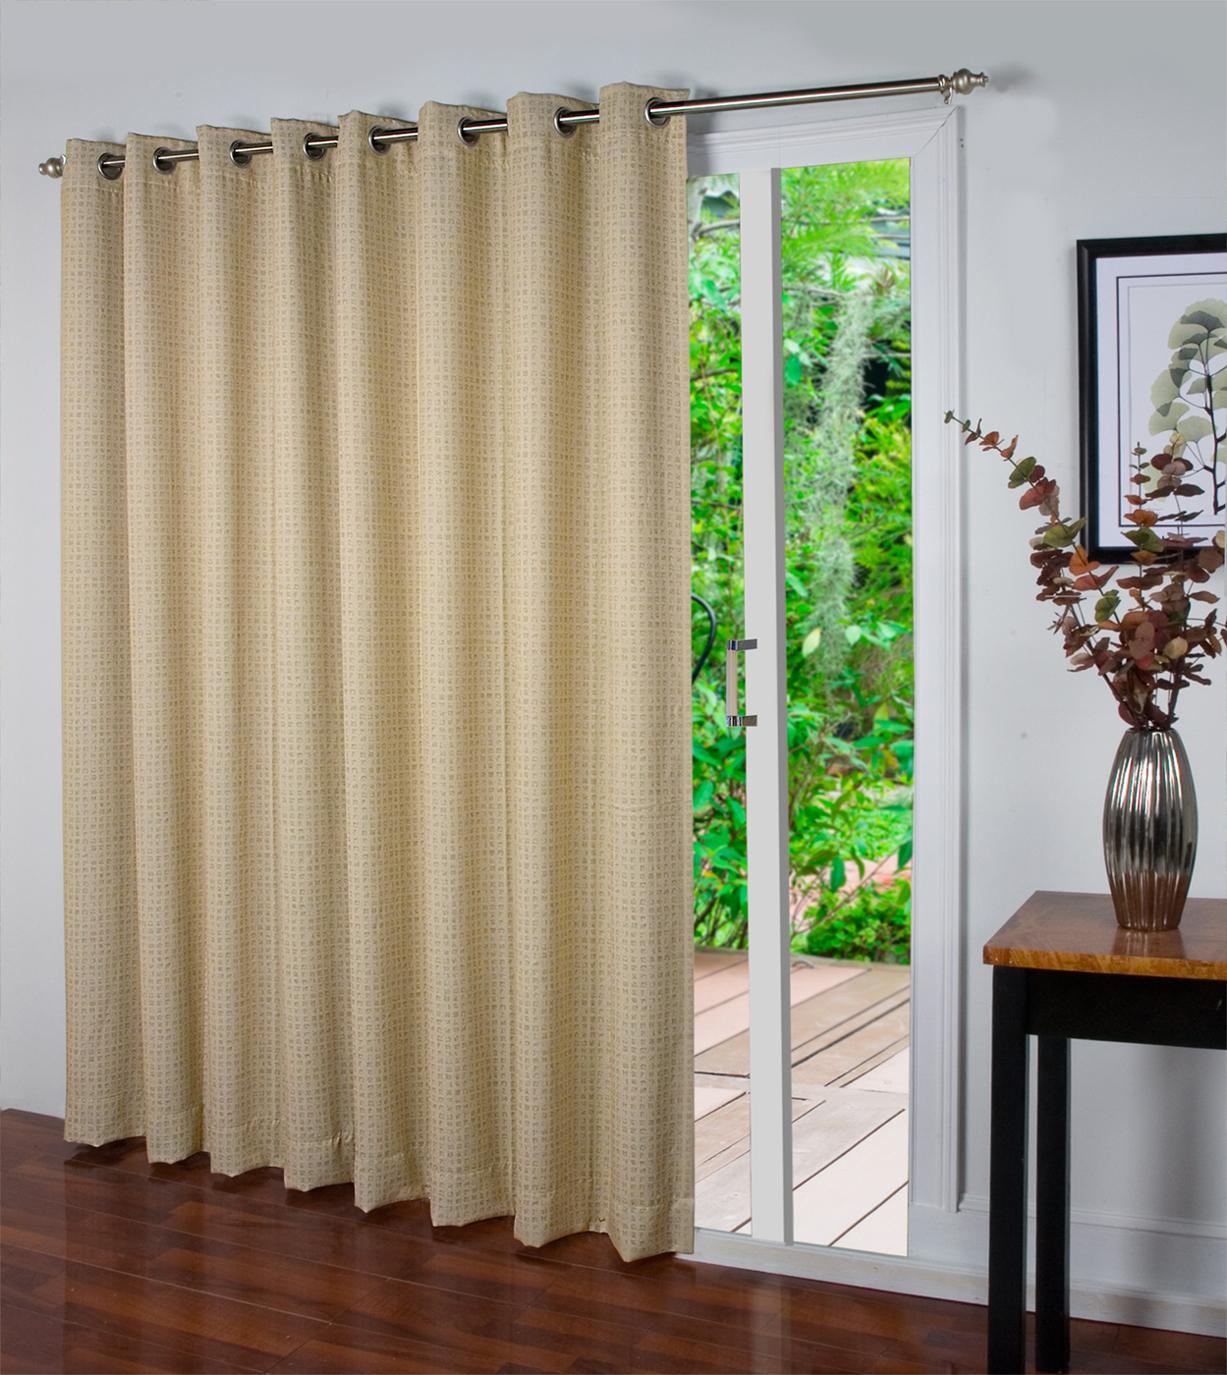 patio door curtains - thecurtainshop.com QSPKQVY